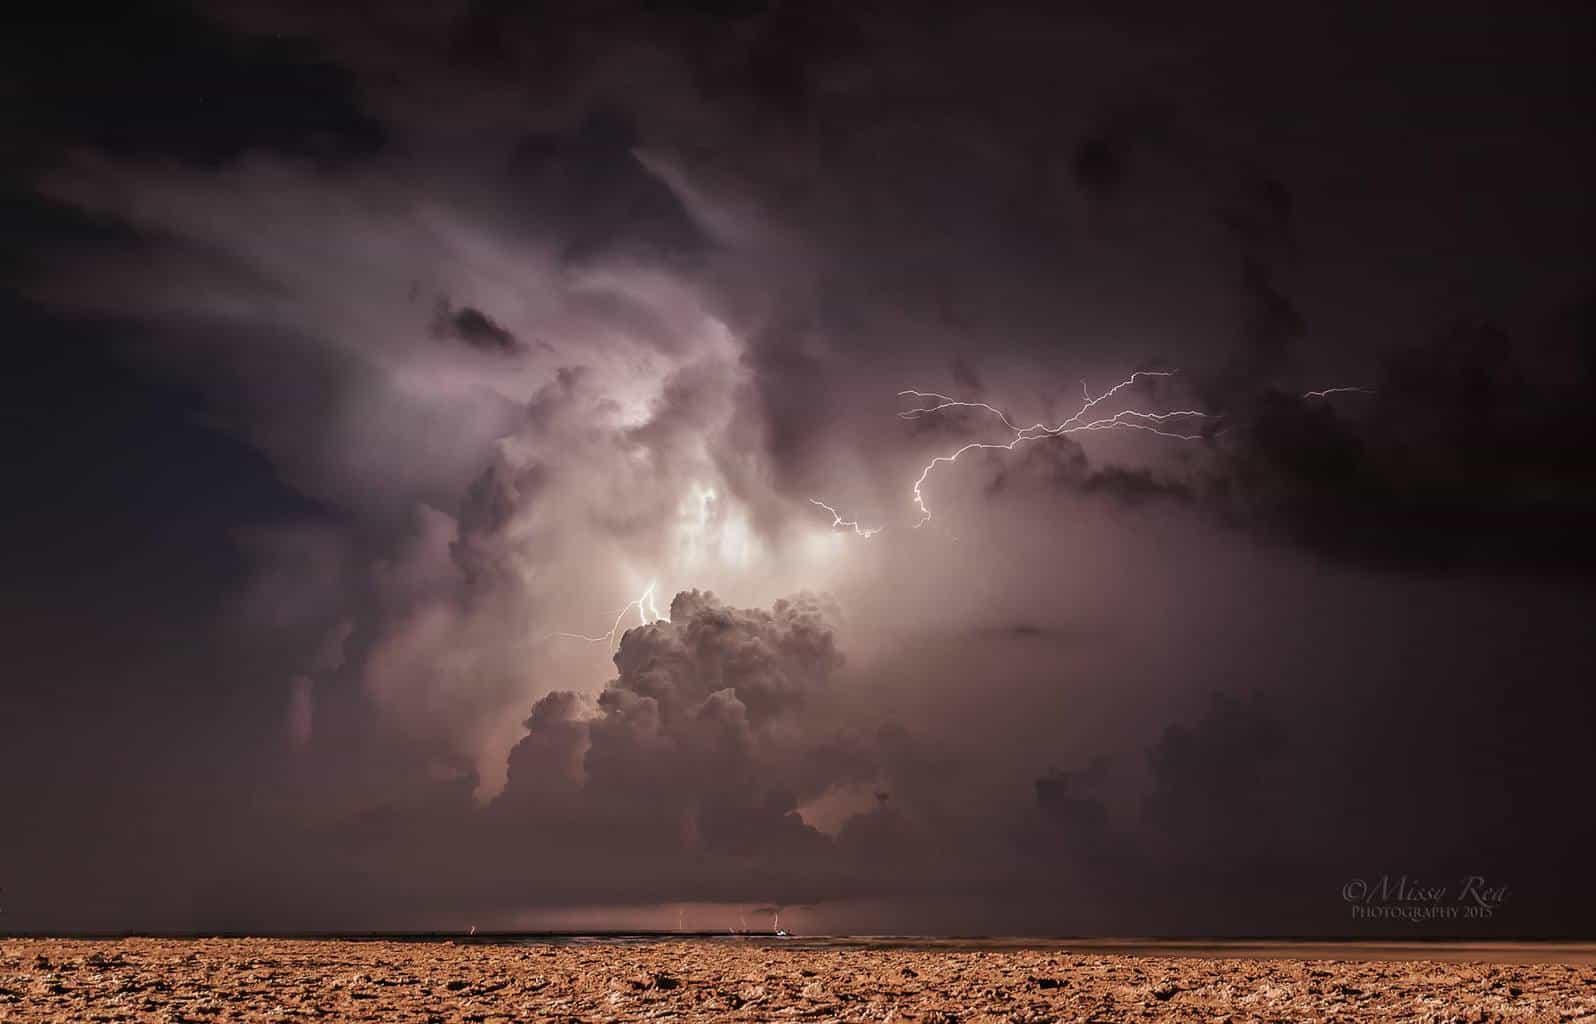 Lightning show off the Texas gulf coast! 23mm 30sec f/4 ISO200